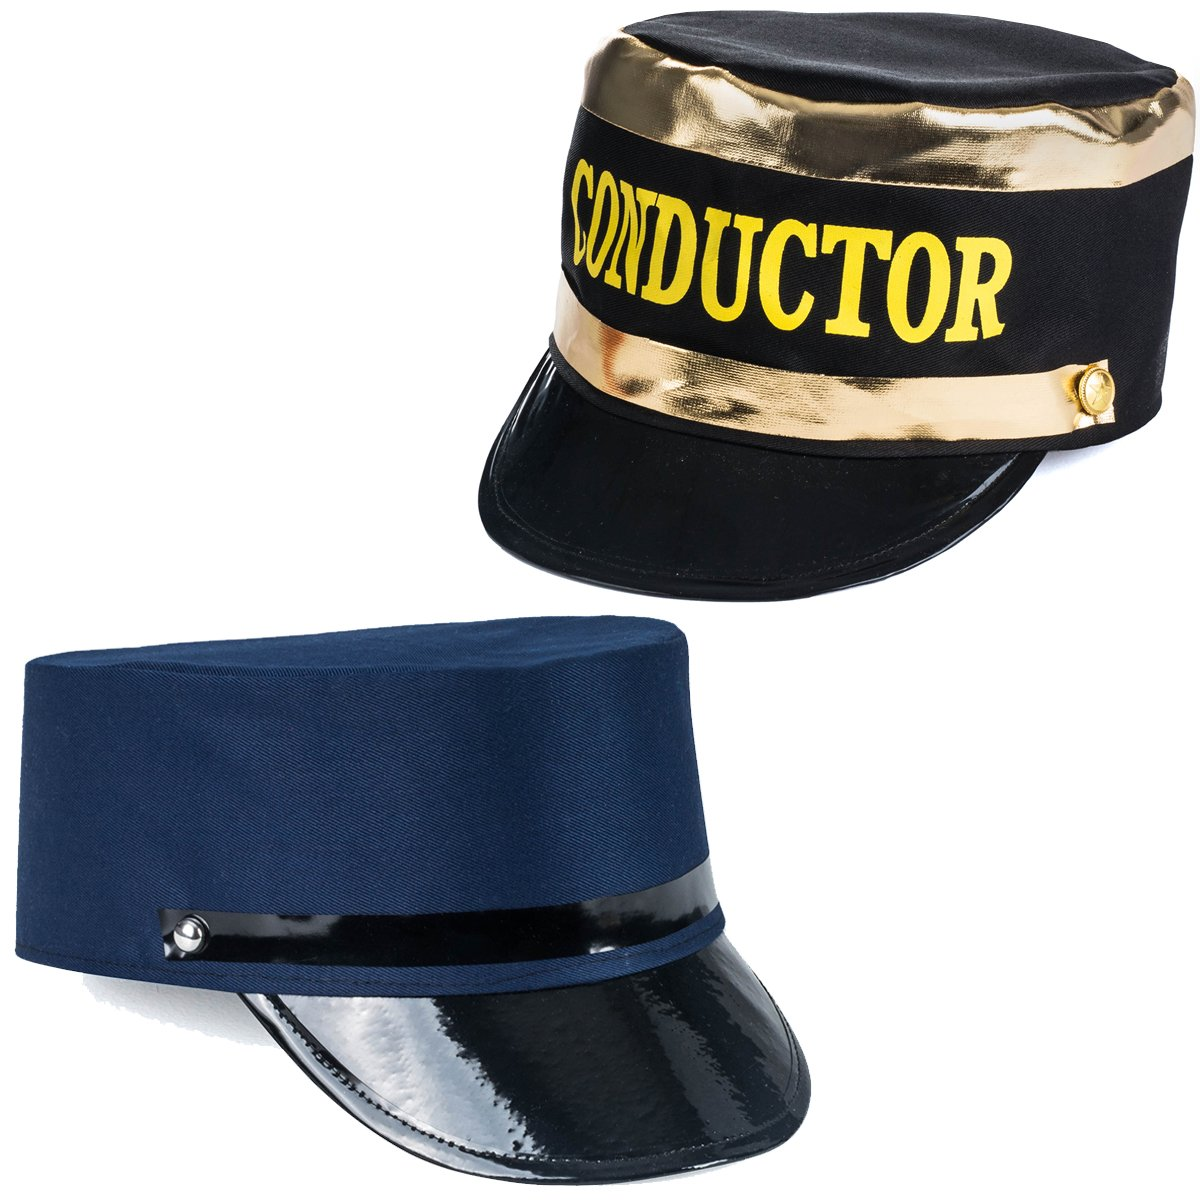 7eb1f5f7419 Get Quotations · Tigerdoe Conductor Hat - Train Engineer Hats - Costume Hats  - (2 Pack) Dress